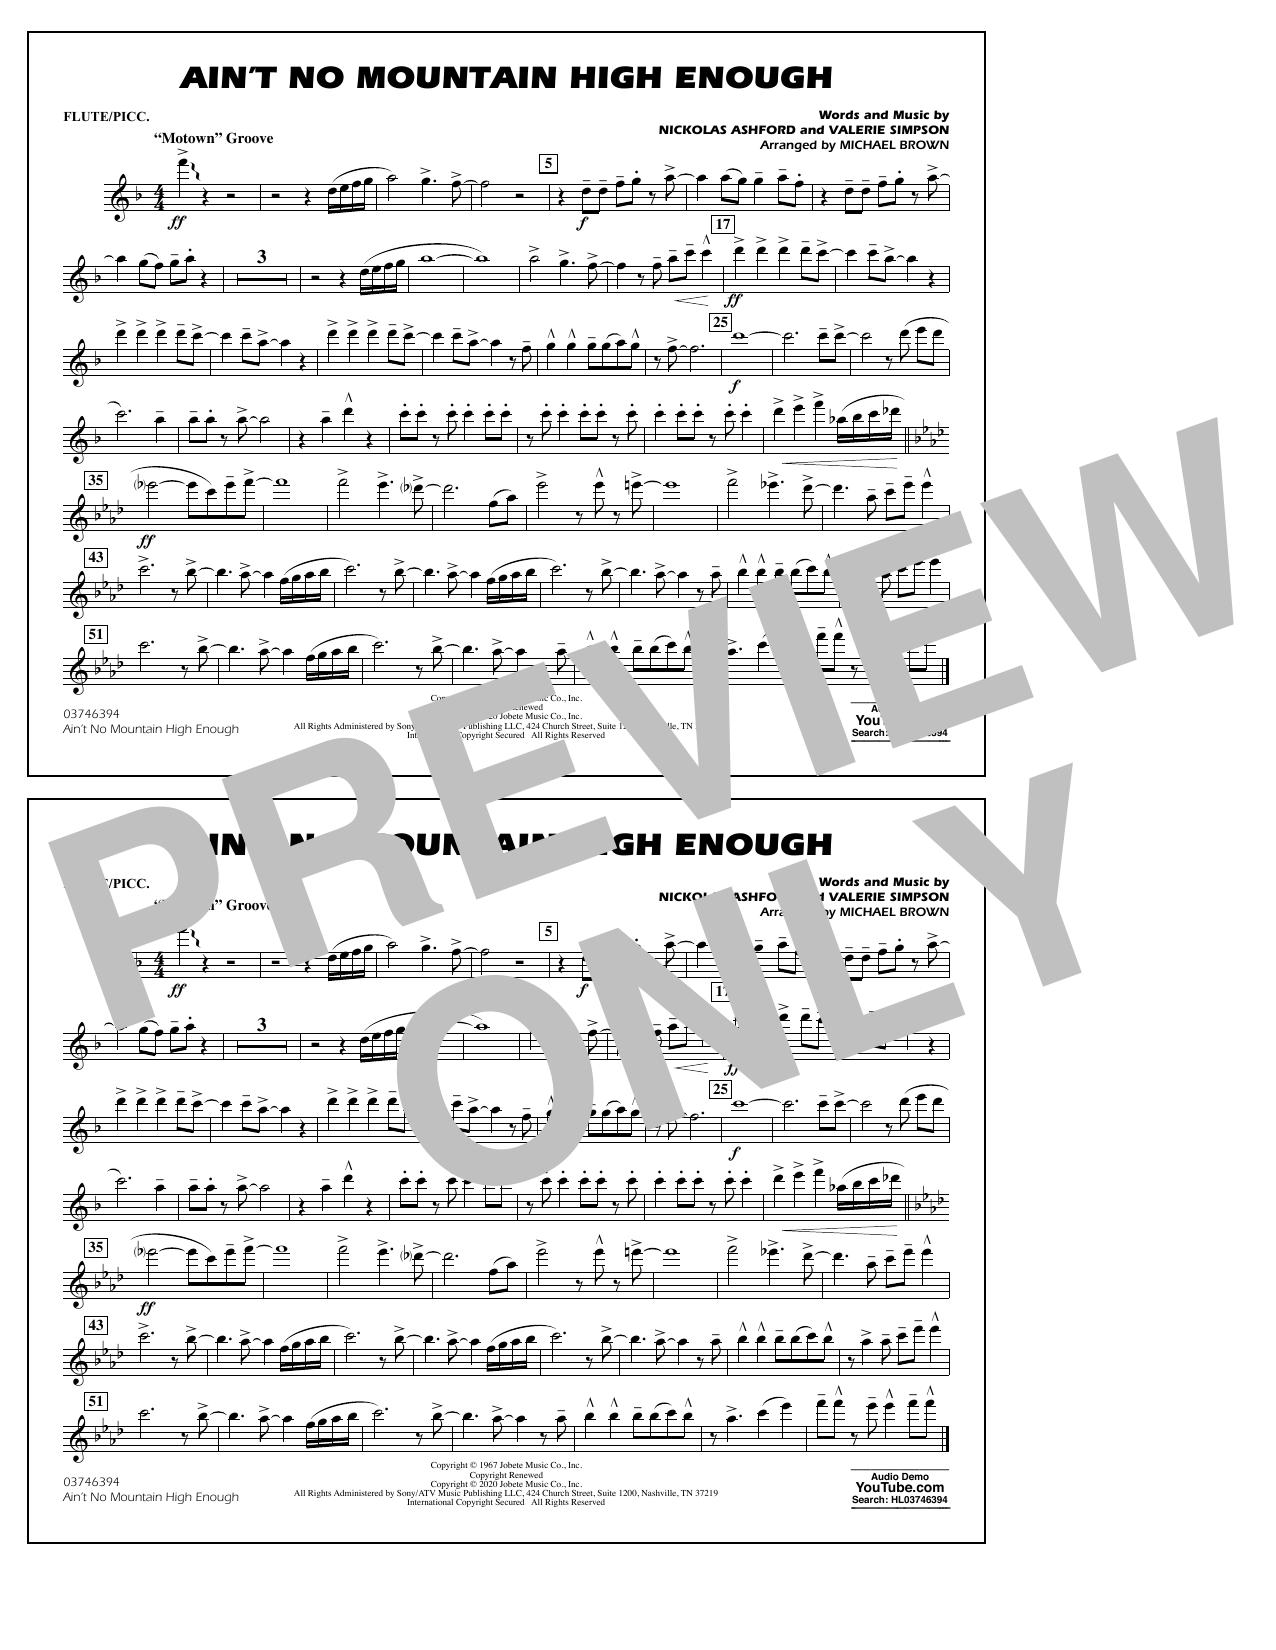 Ain't No Mountain High Enough (arr. Michael Brown) - Flute/Piccolo Sheet Music